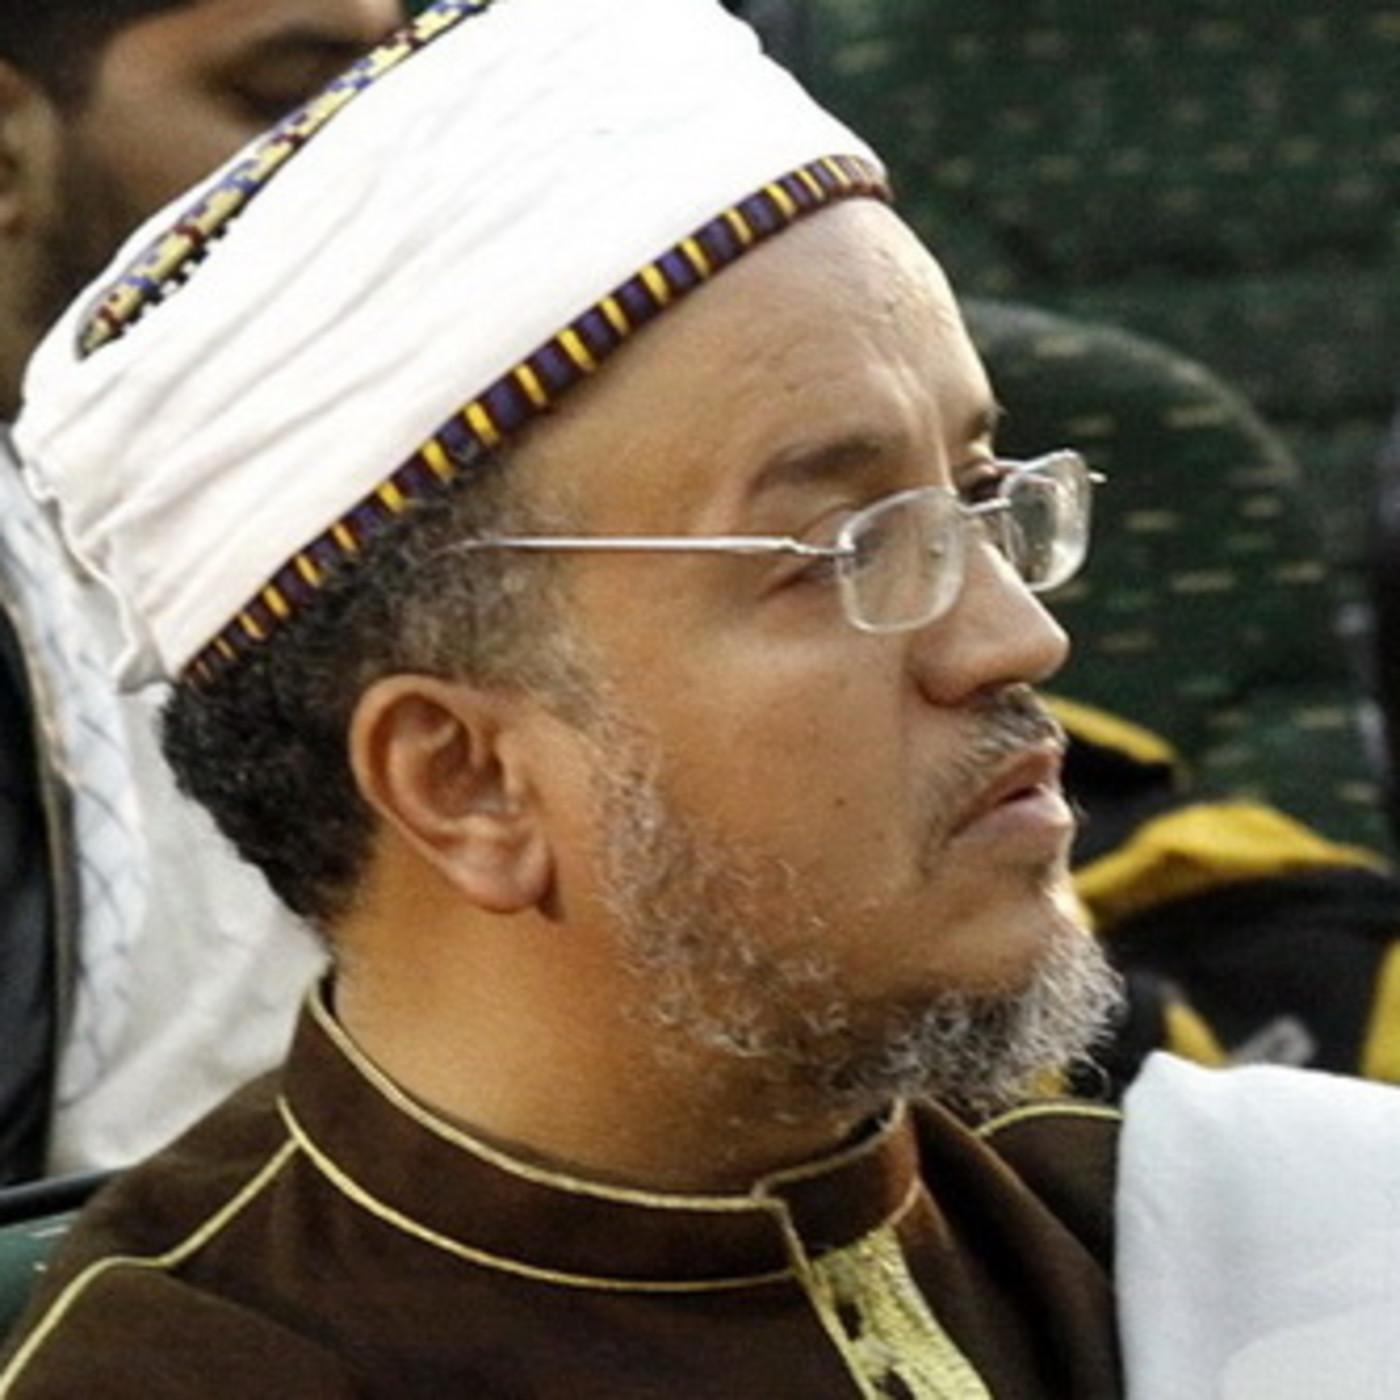 La Historia súper interesante de un wahabita converso al islam